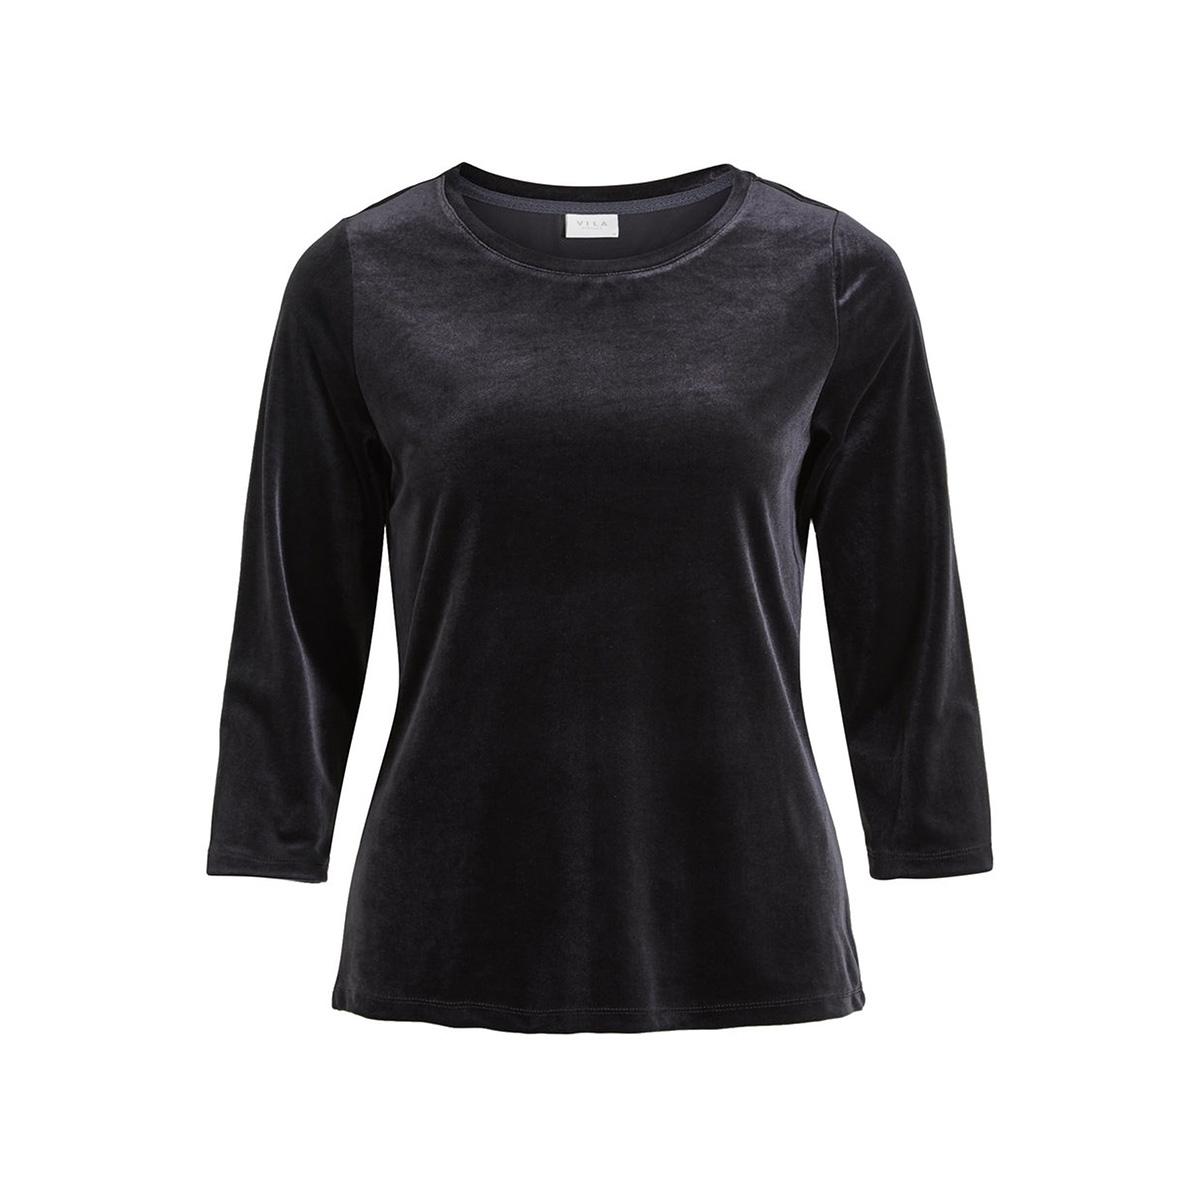 visienna 3/4 top 14050458 vila t-shirt black